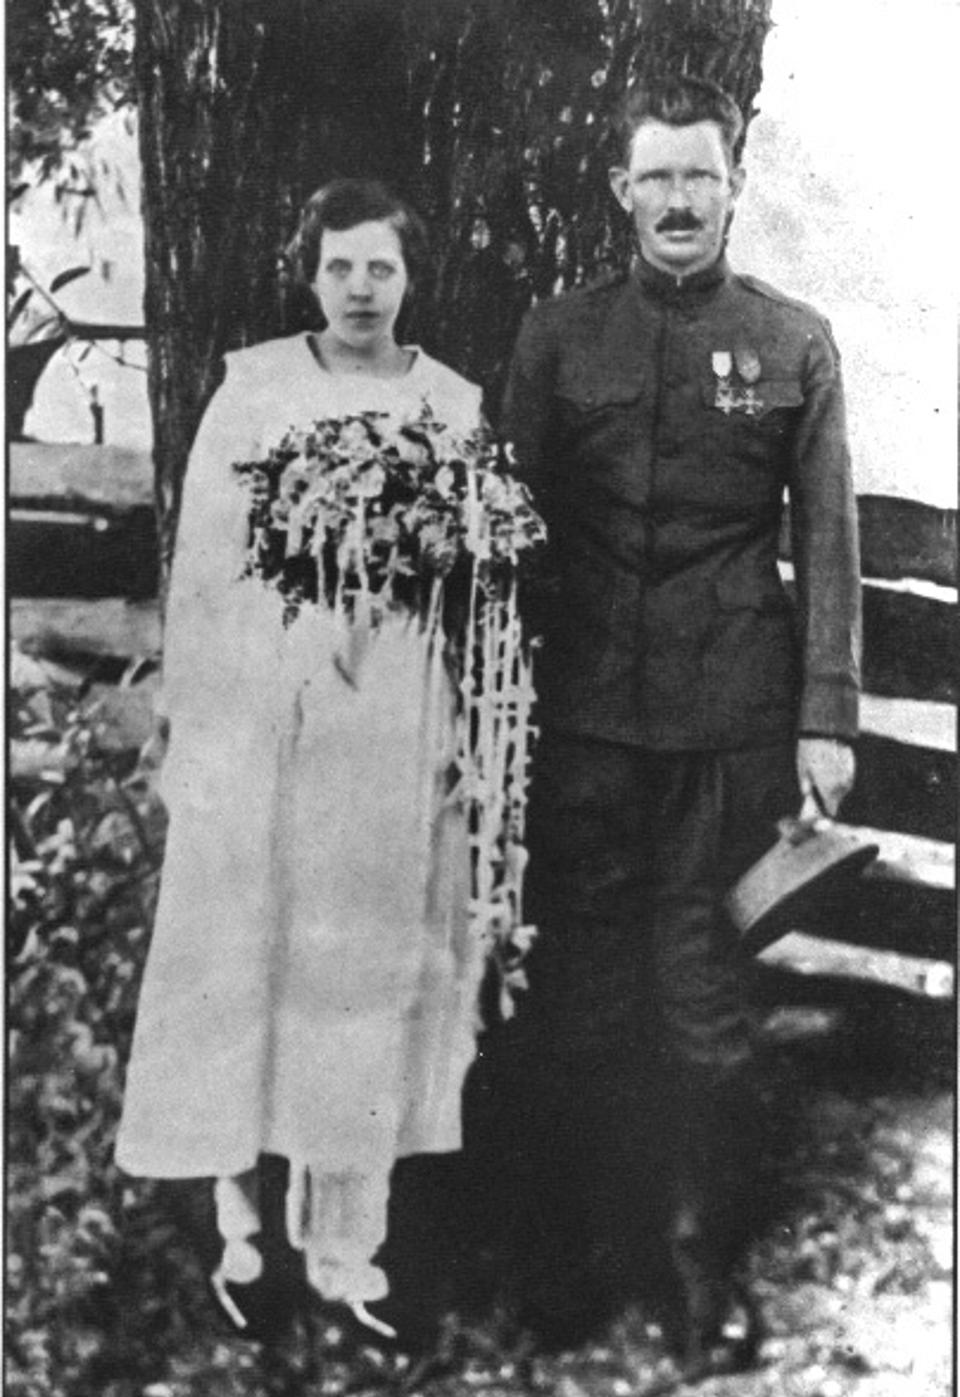 Photograph, Alvin C. York and Gracie Allen